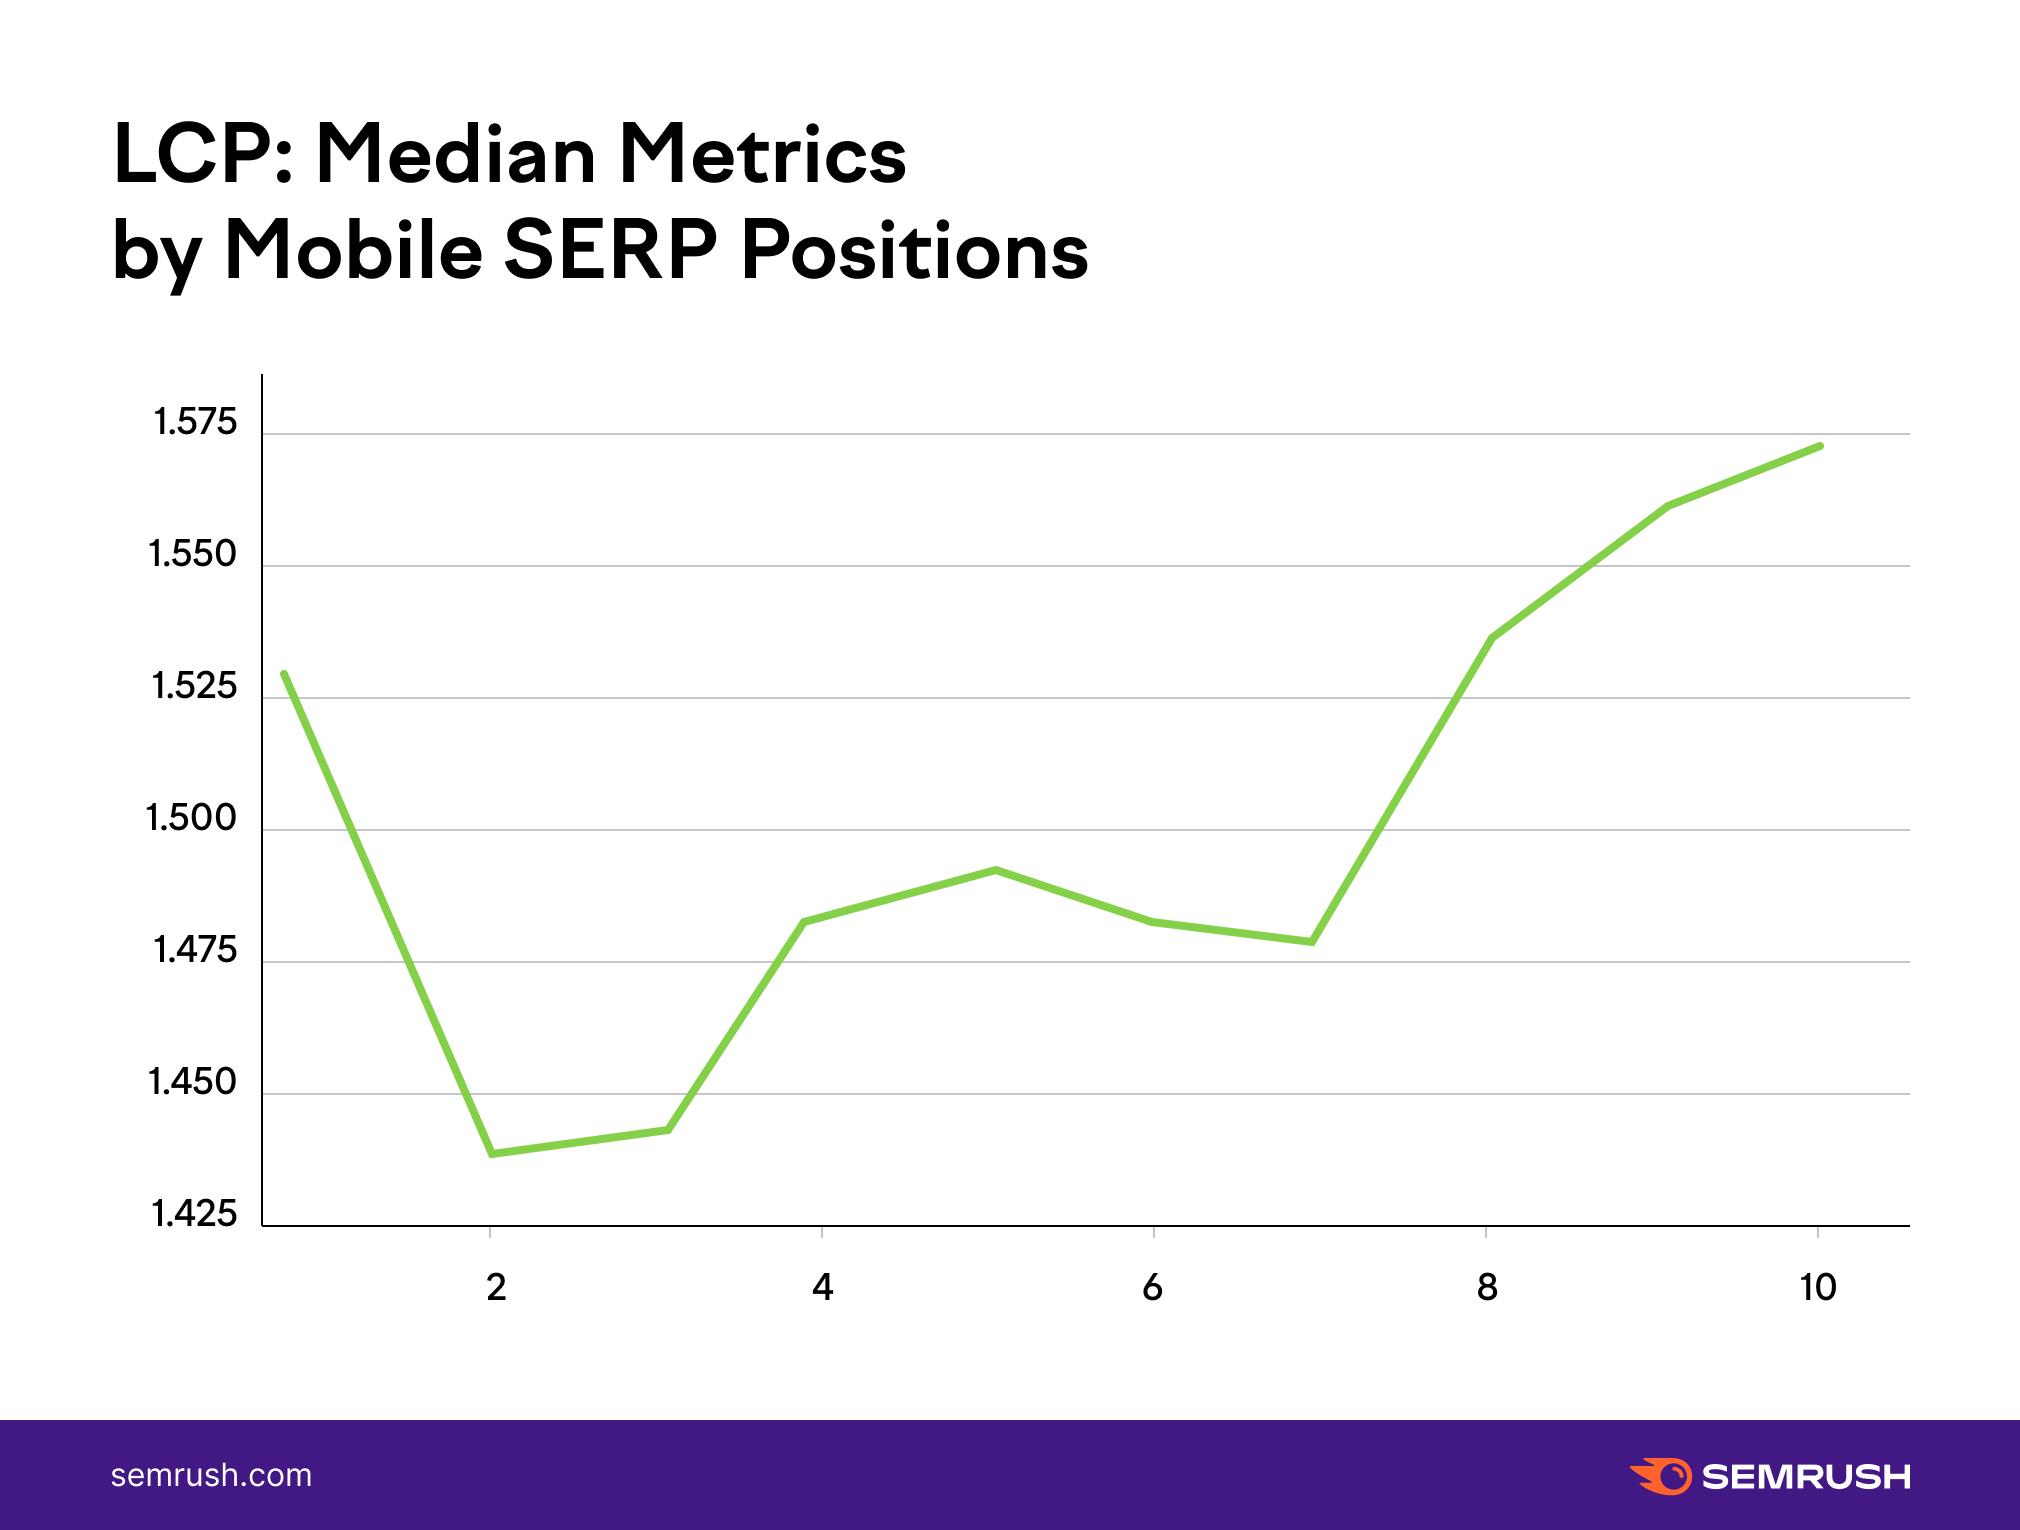 10 LCP median metrics position on SERP